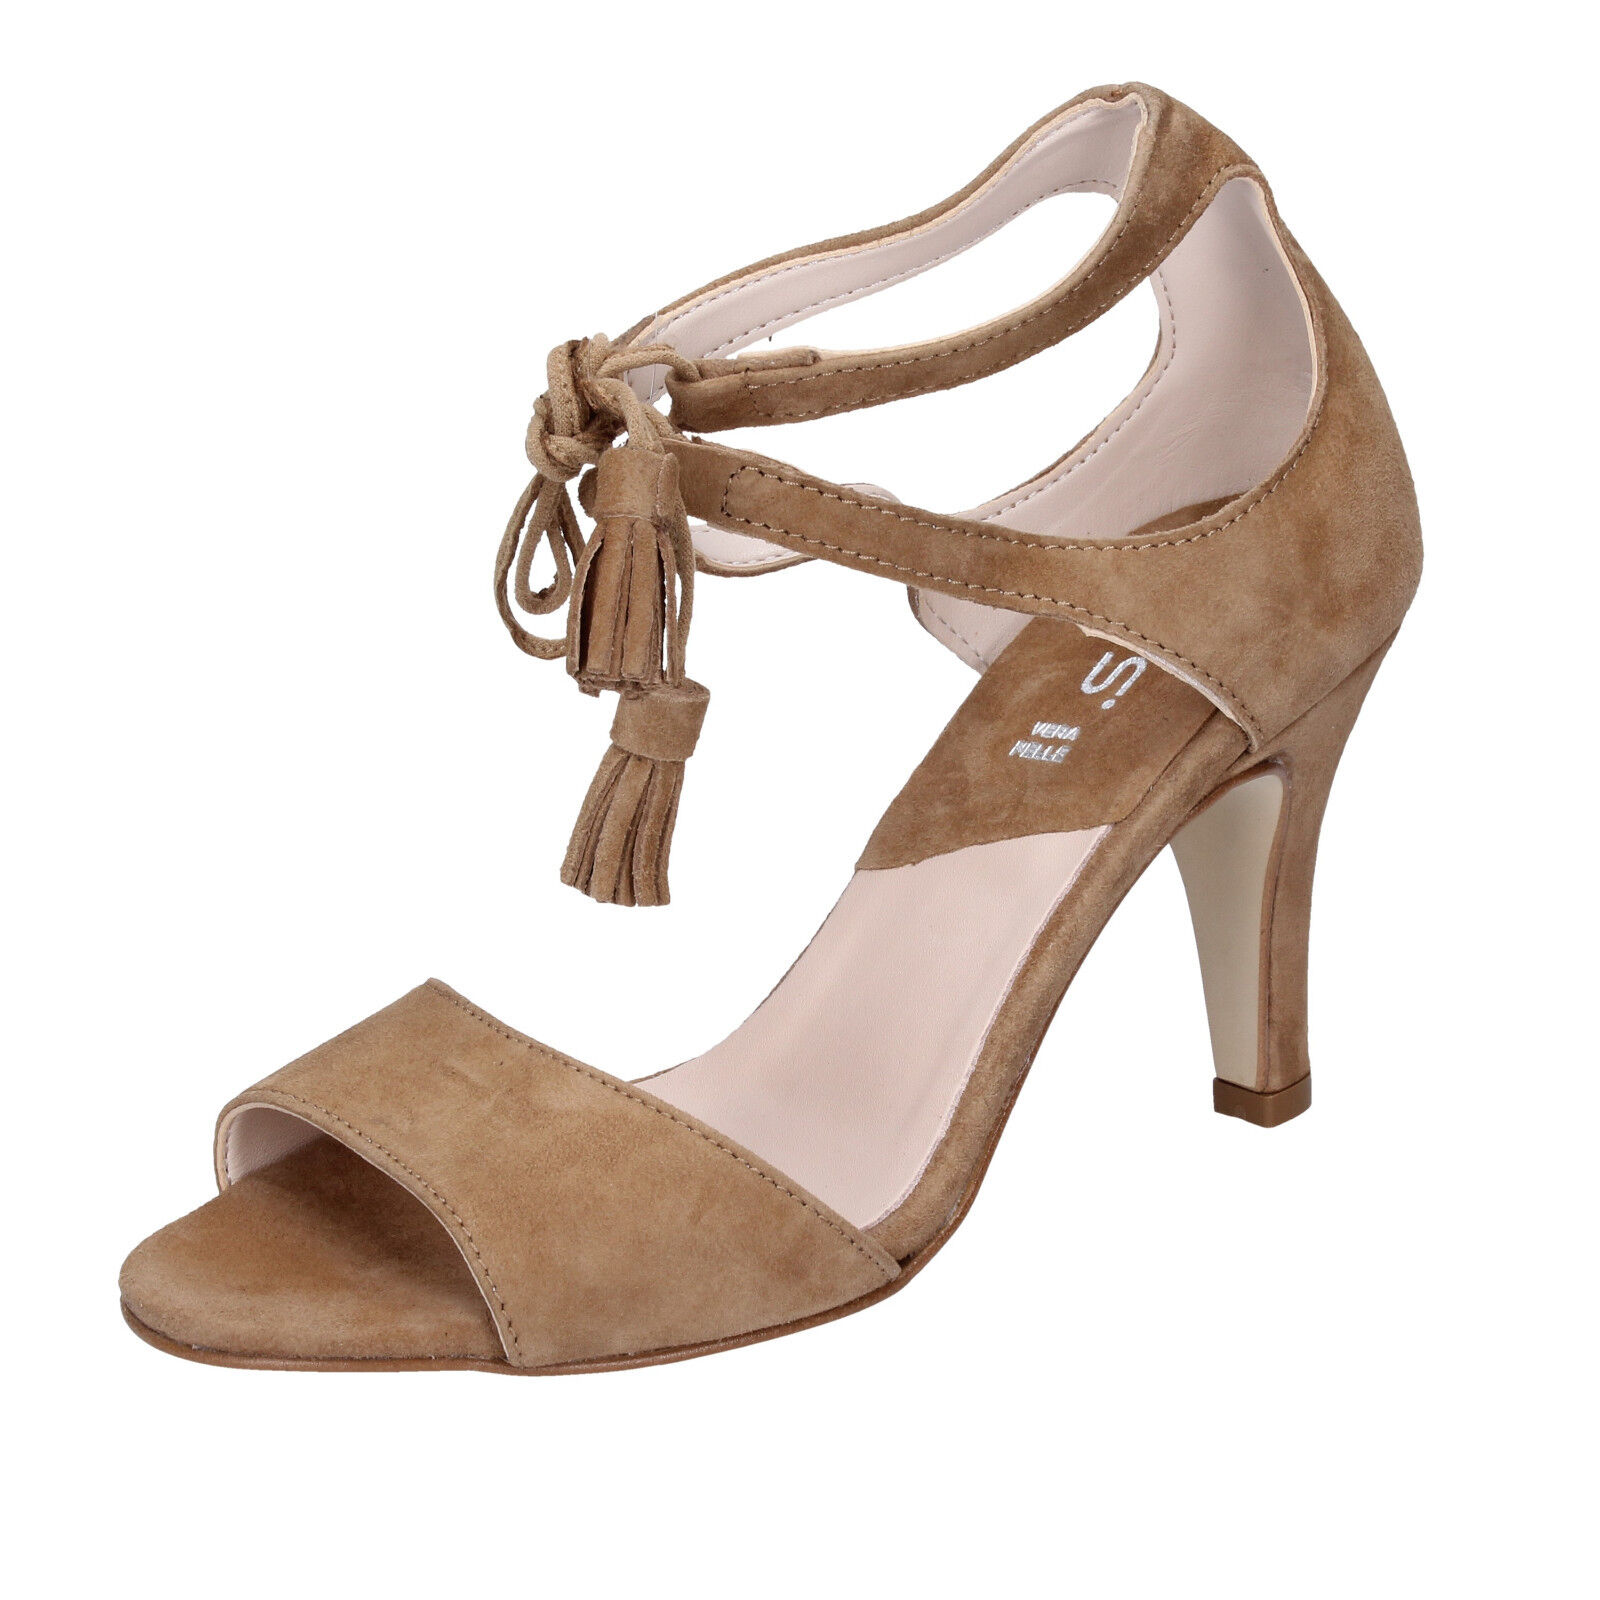 Scarpe donna donna donna KEYS 36 EU sandali Marroneee camoscio BT990-36 | Discount  133bcd